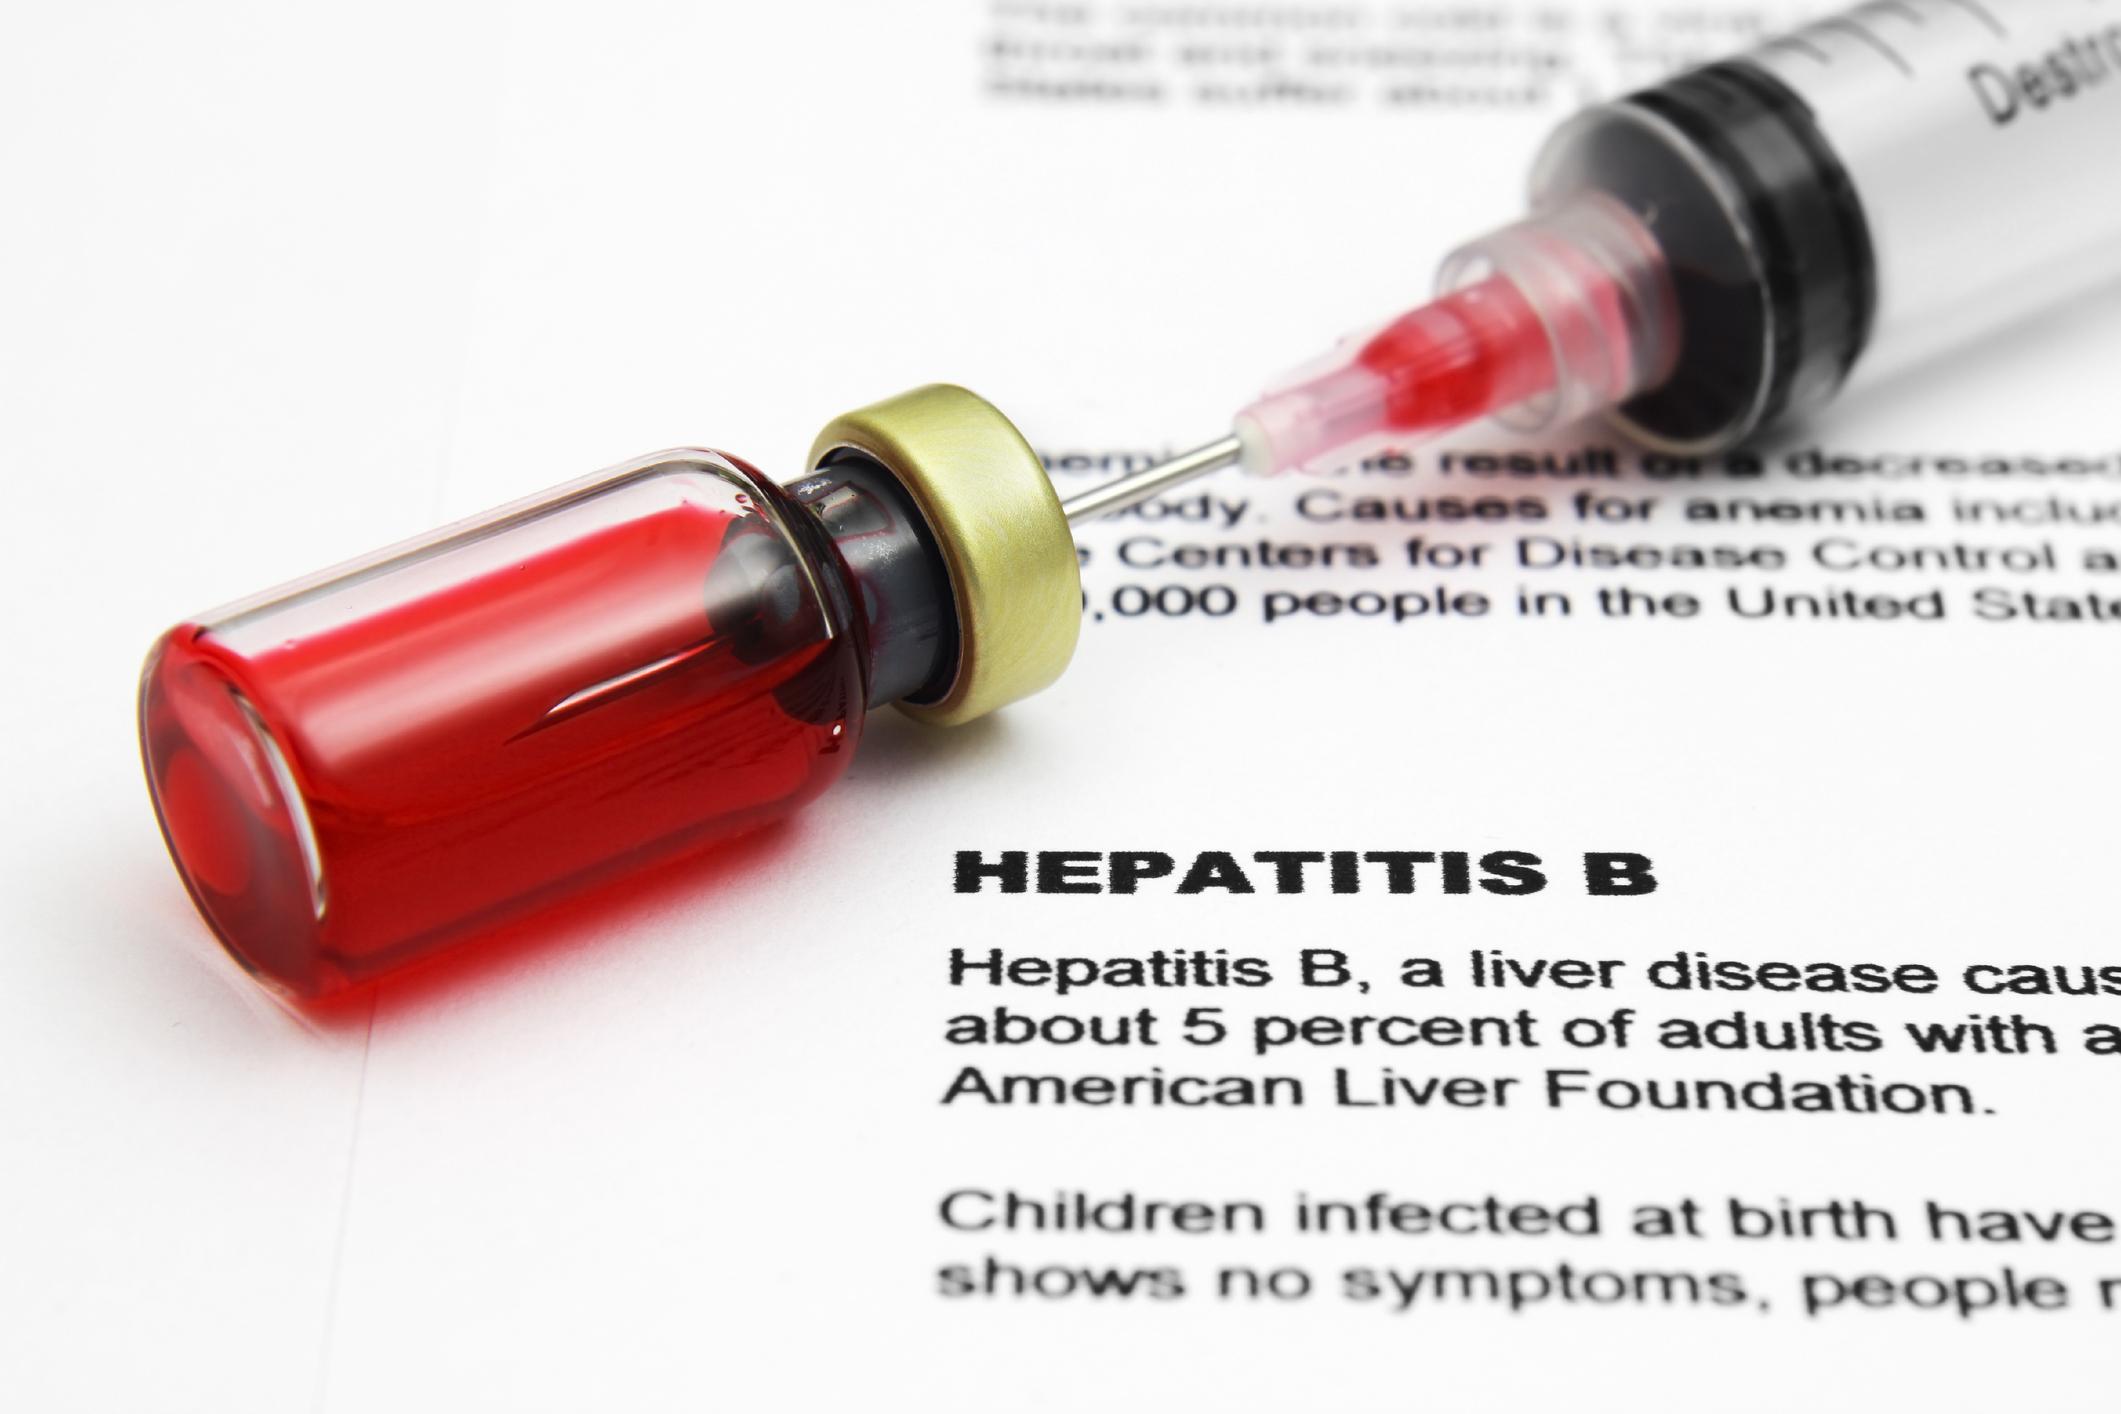 Syringe and vial on top of hepatitis B document